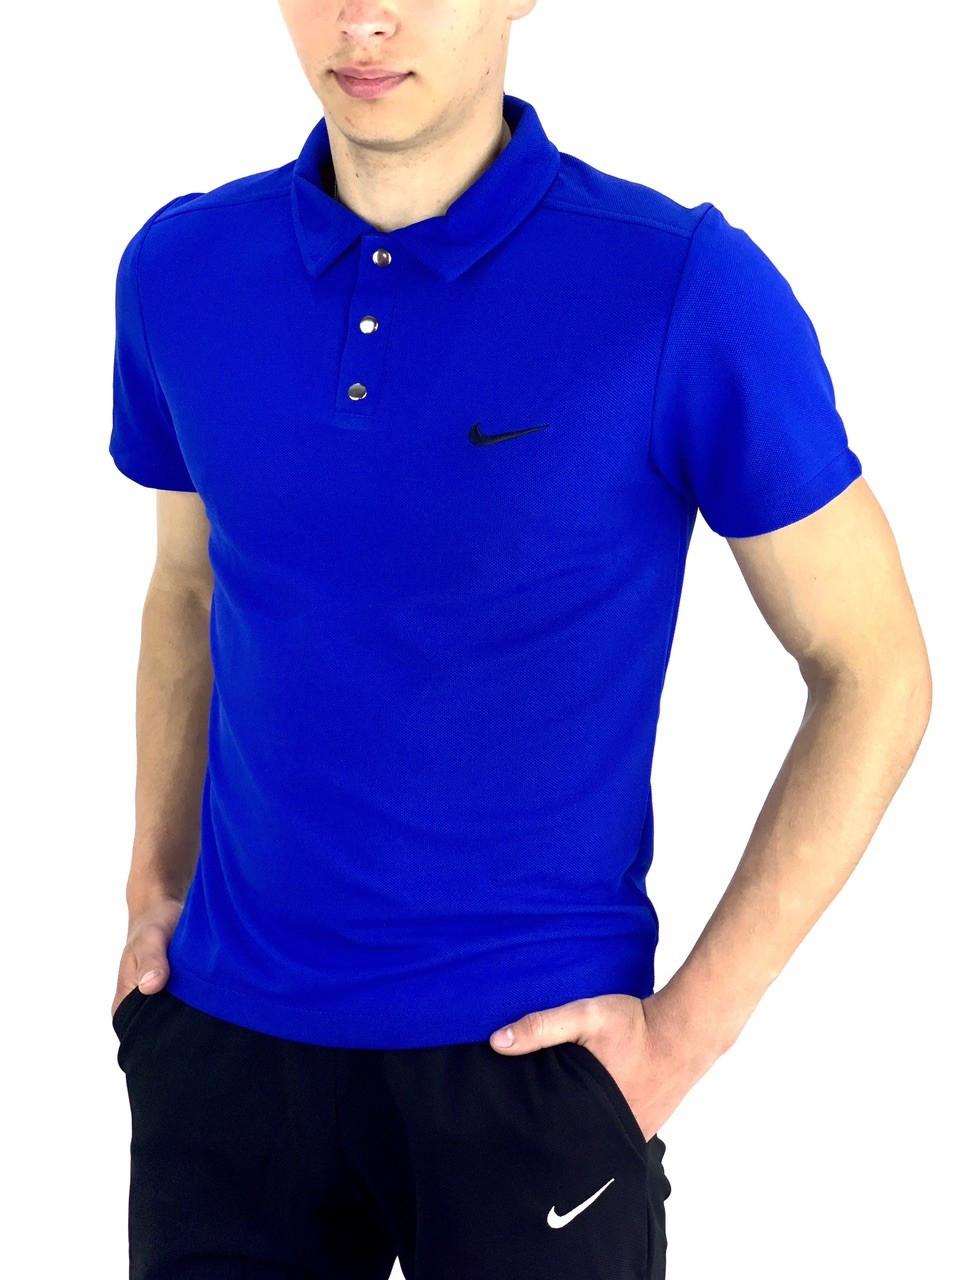 Чоловіча синя повсякденна футболка поло Nike